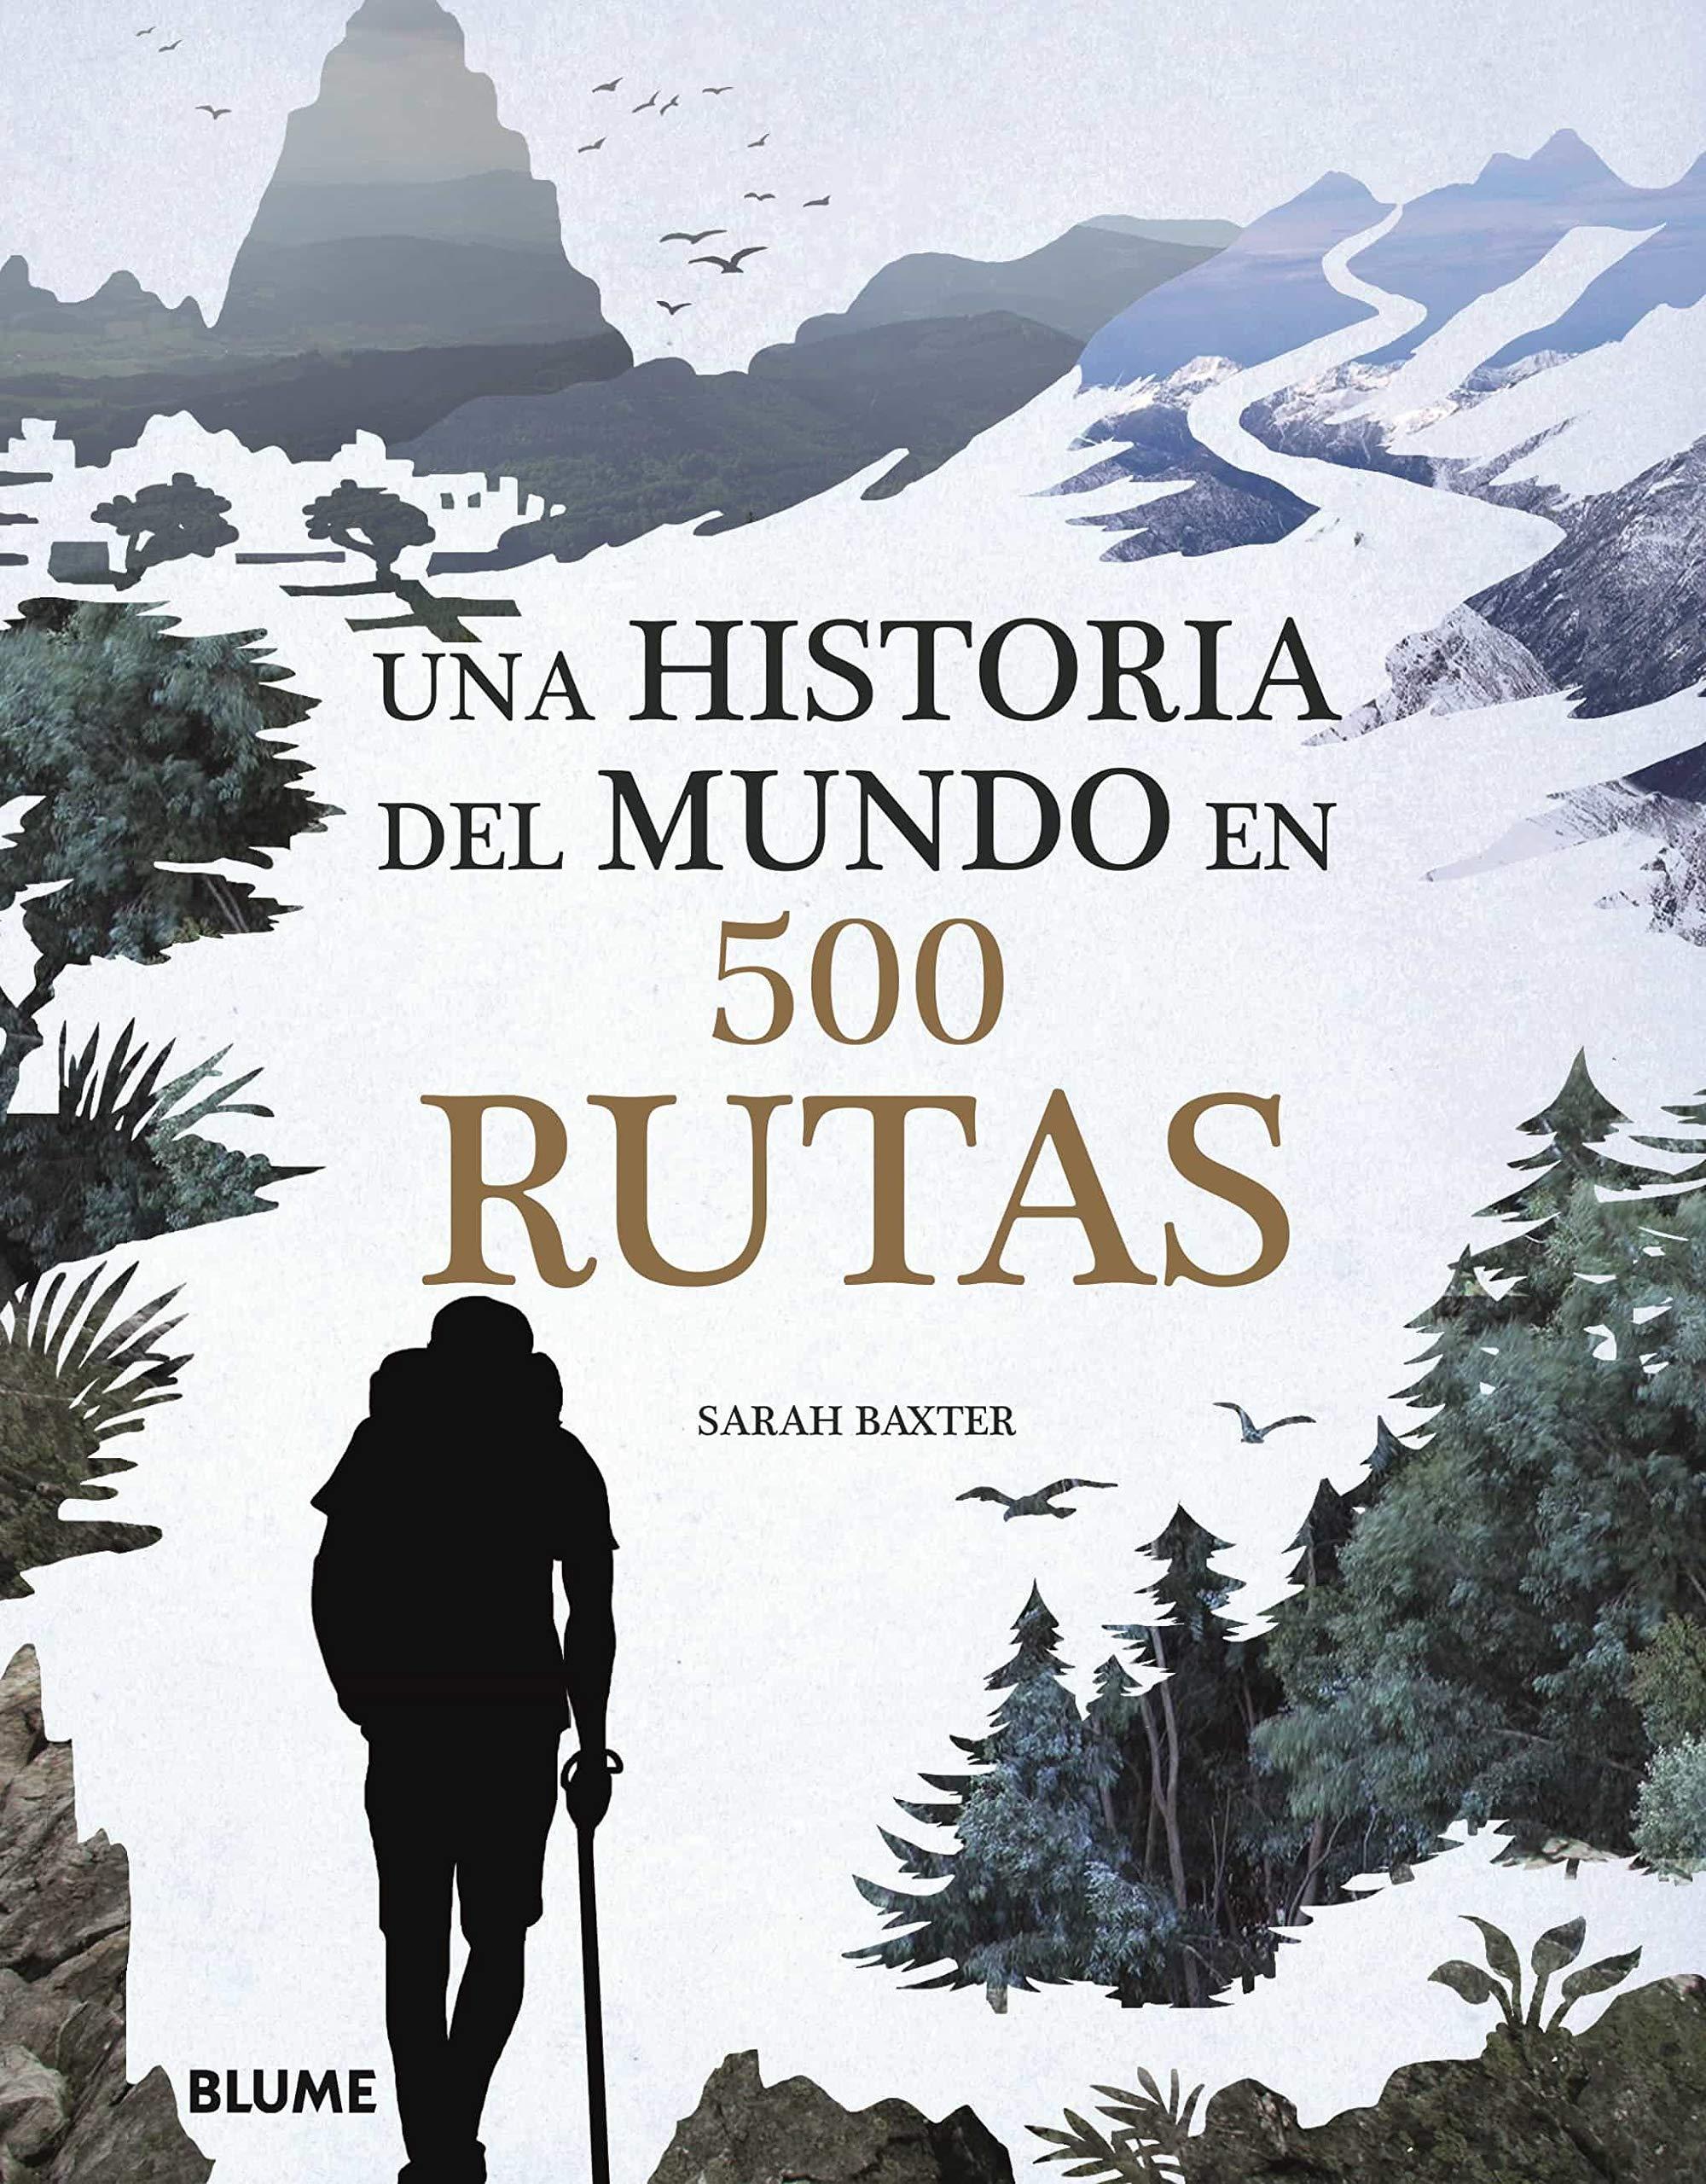 Una historia del mundo en 500 rutas: Amazon.es: Baxter, Sarah, Rodríguez Fischer, Cristina, Delgado Pico, Lluïs: Libros